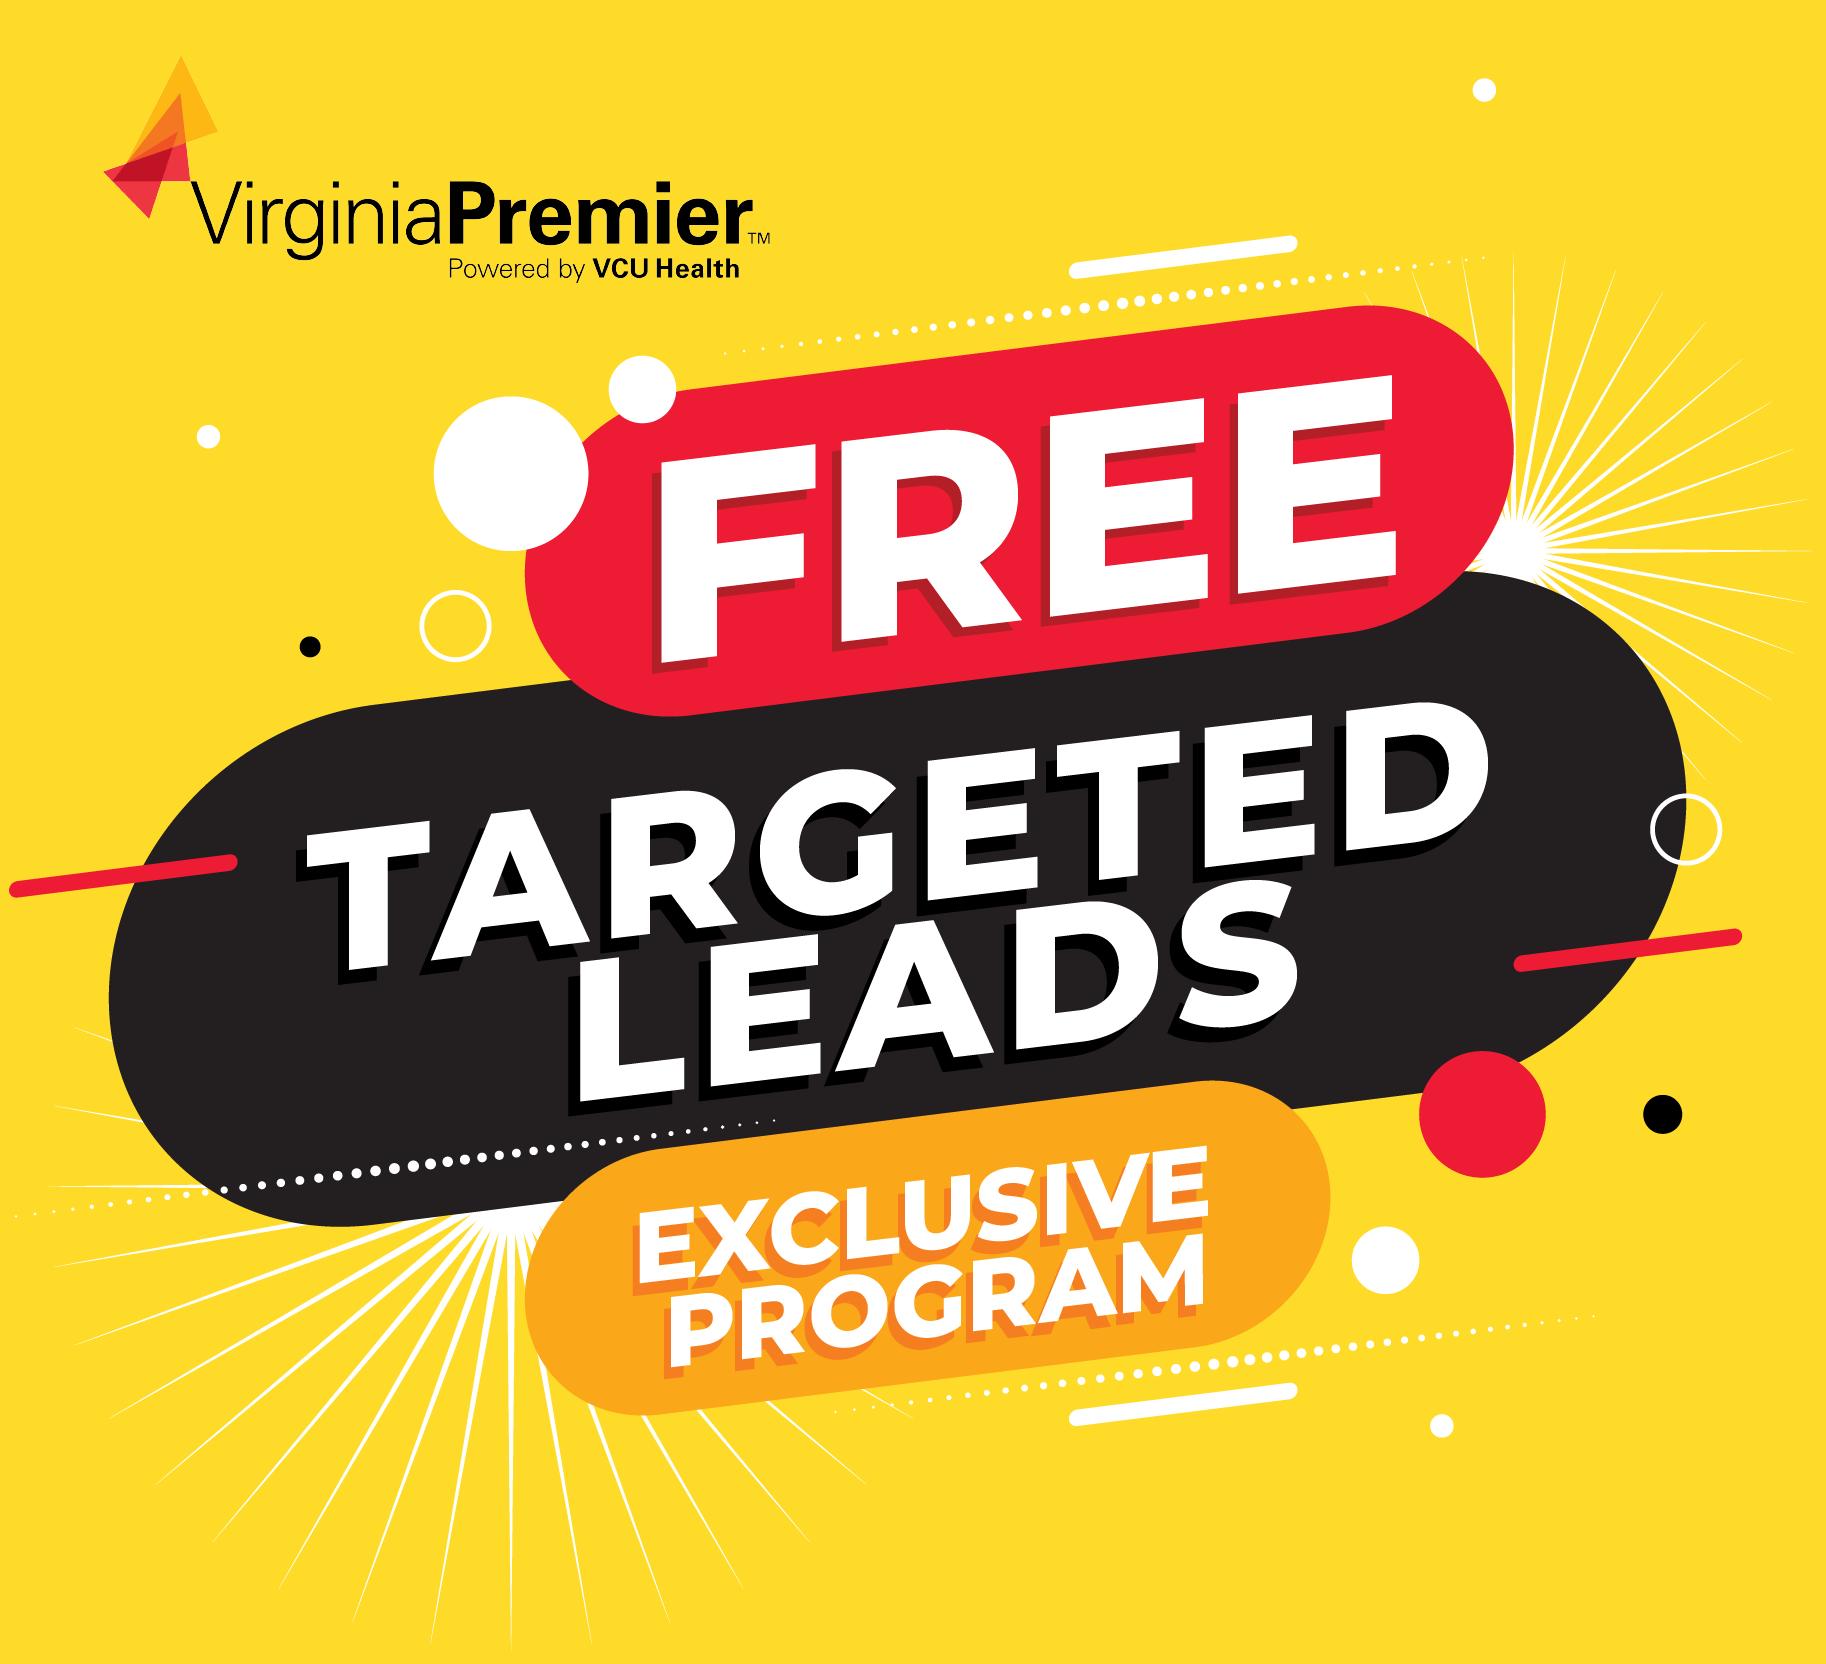 Virginia Premier Free targeted leads exclusive